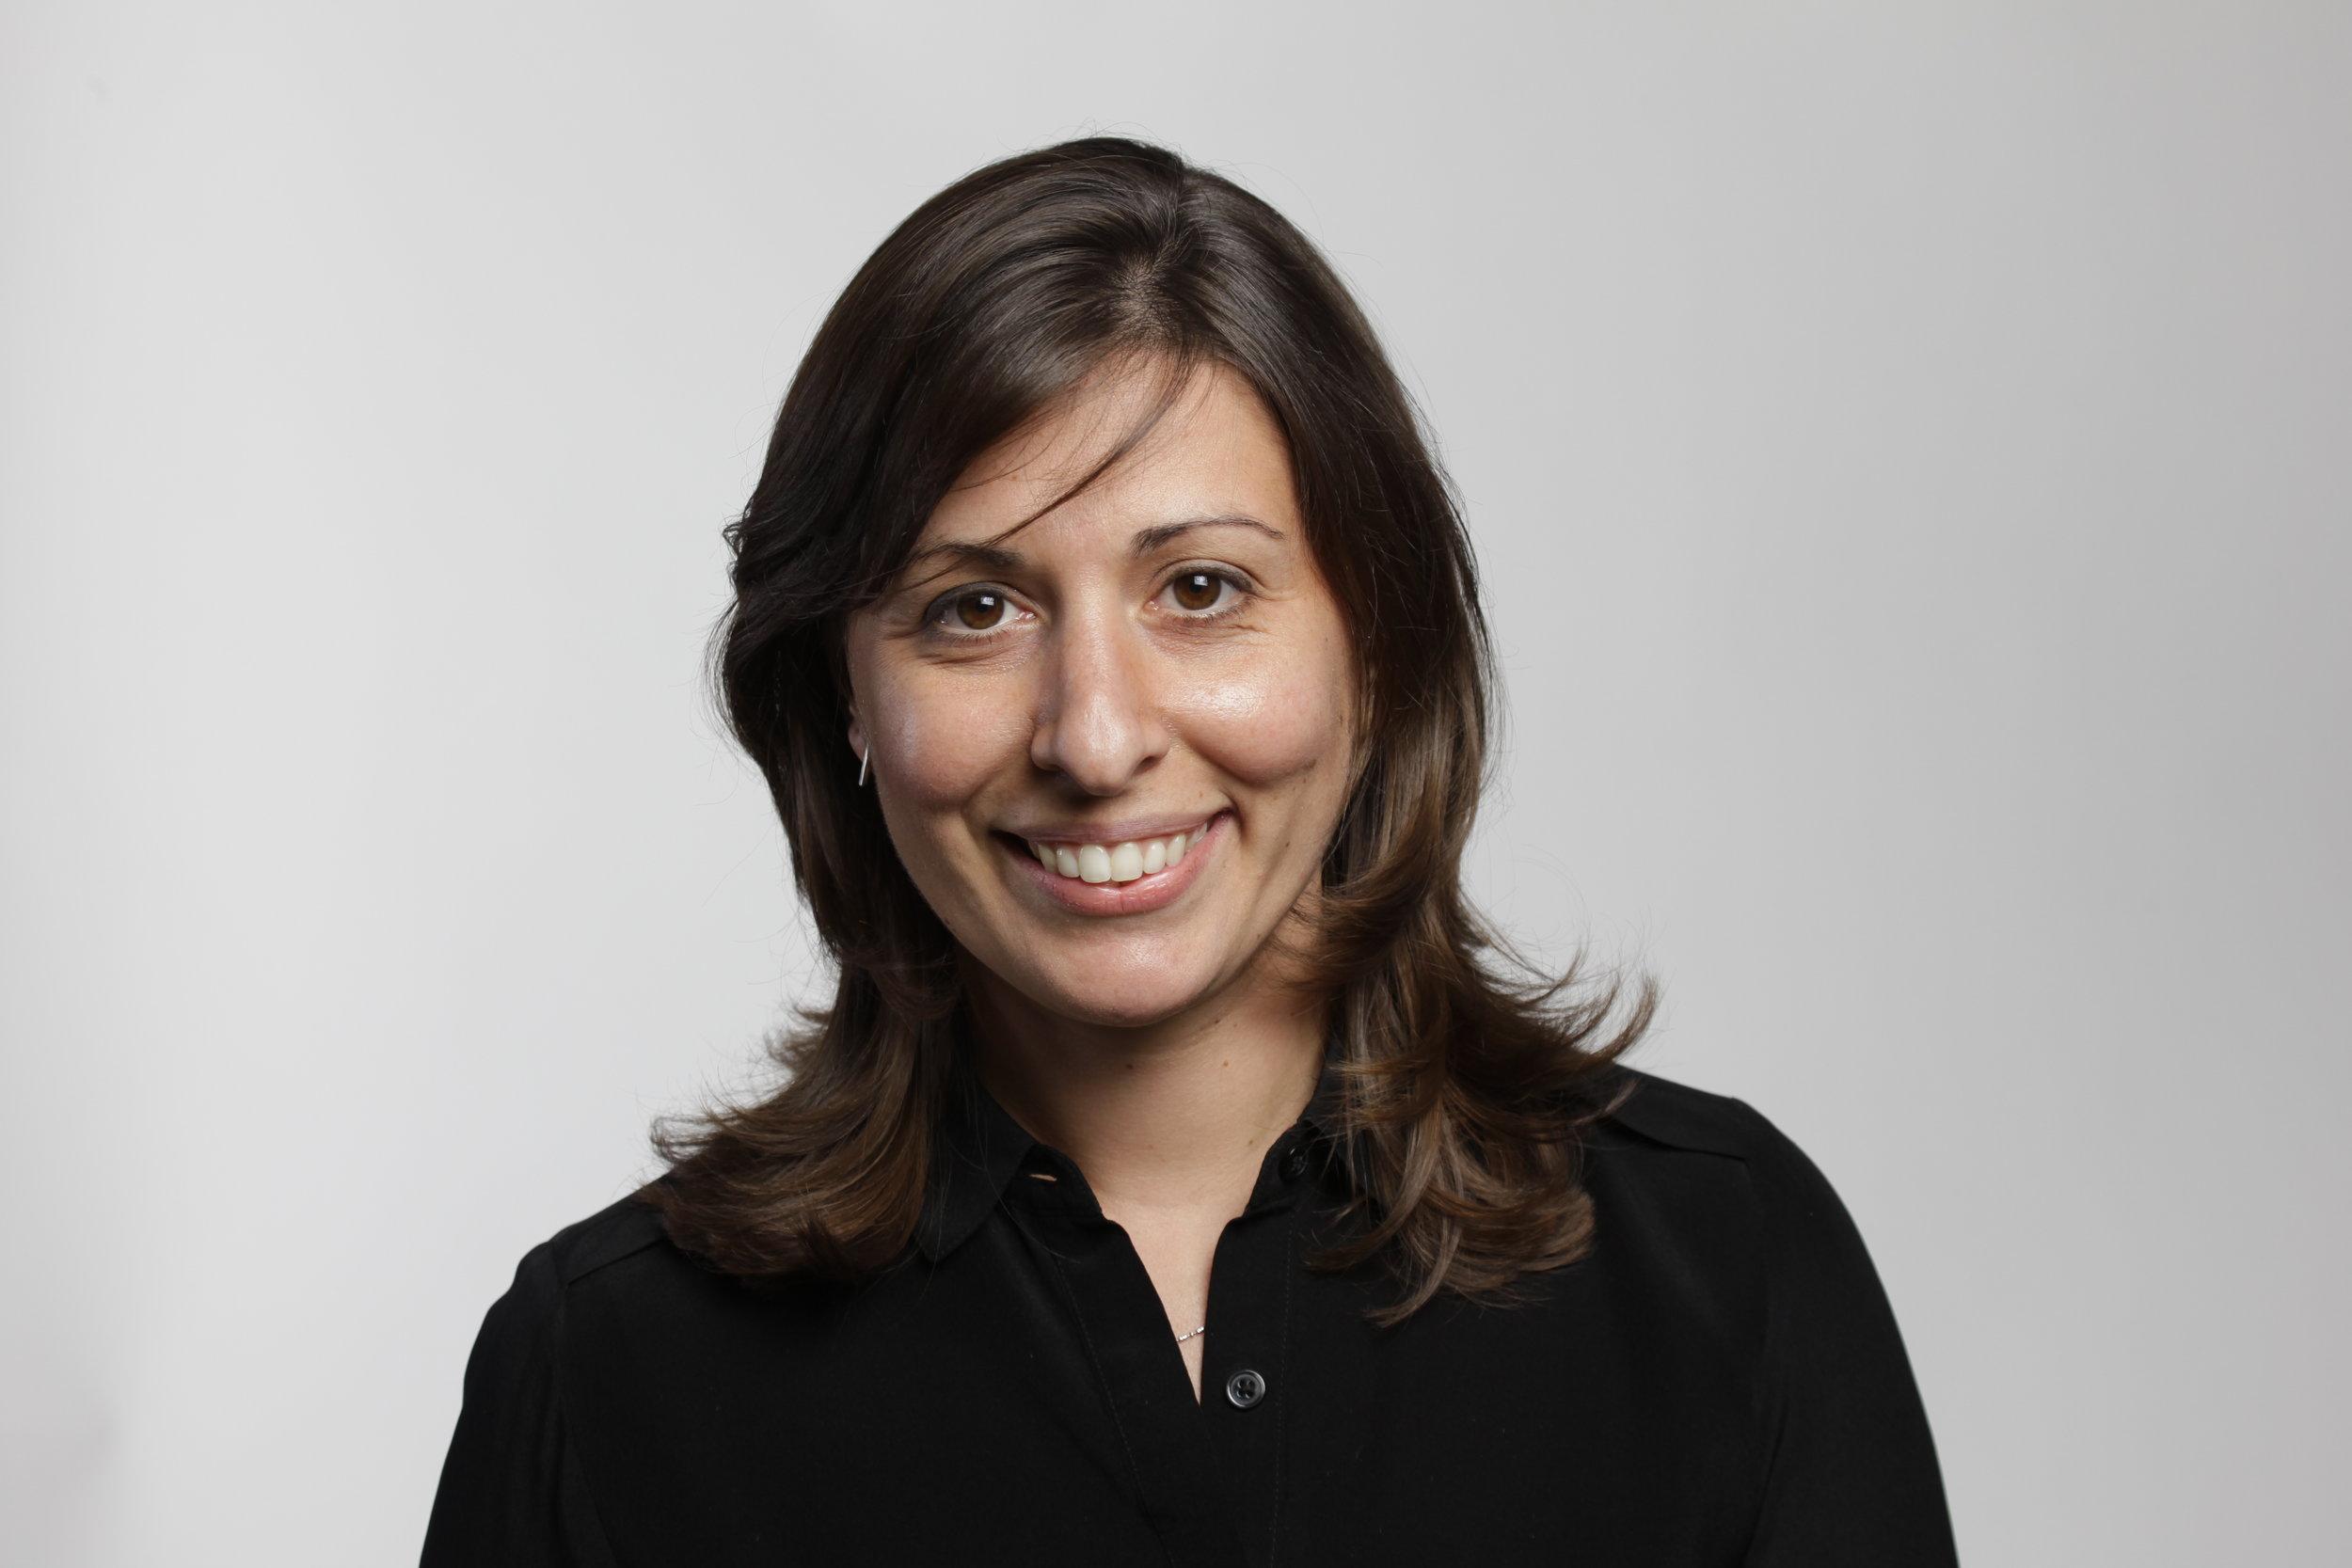 Nicolette Mastrangelo, AIA -Facilitator